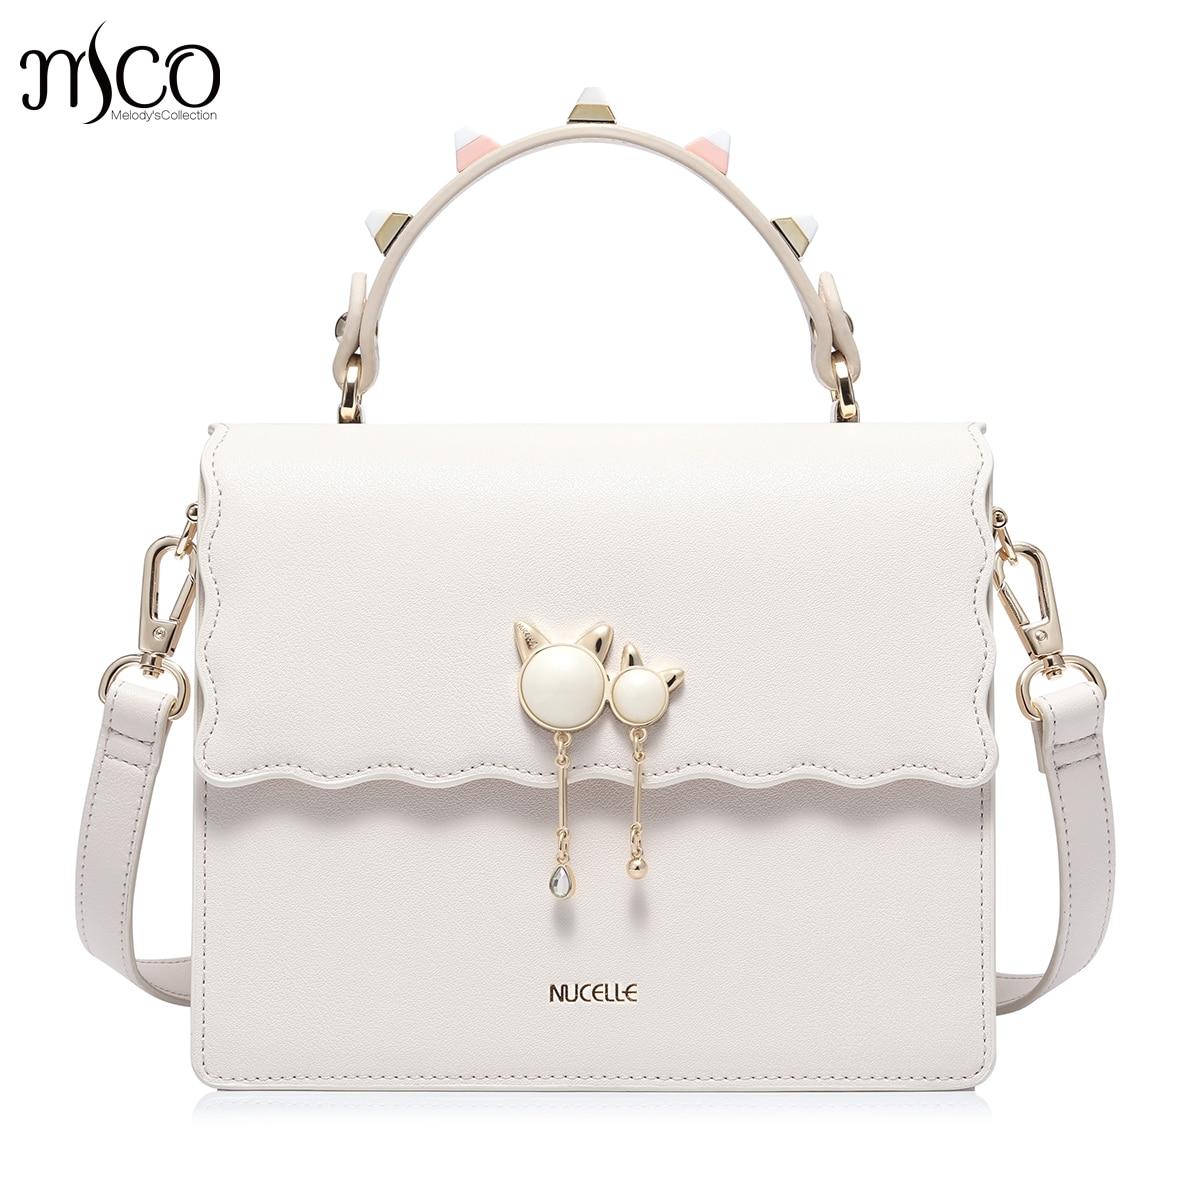 Just Star 2018 Brand Design Fashion Classic PU Leather Women Girls Ladies Handbag Shoulder Bags High Quality Sac a Main цена